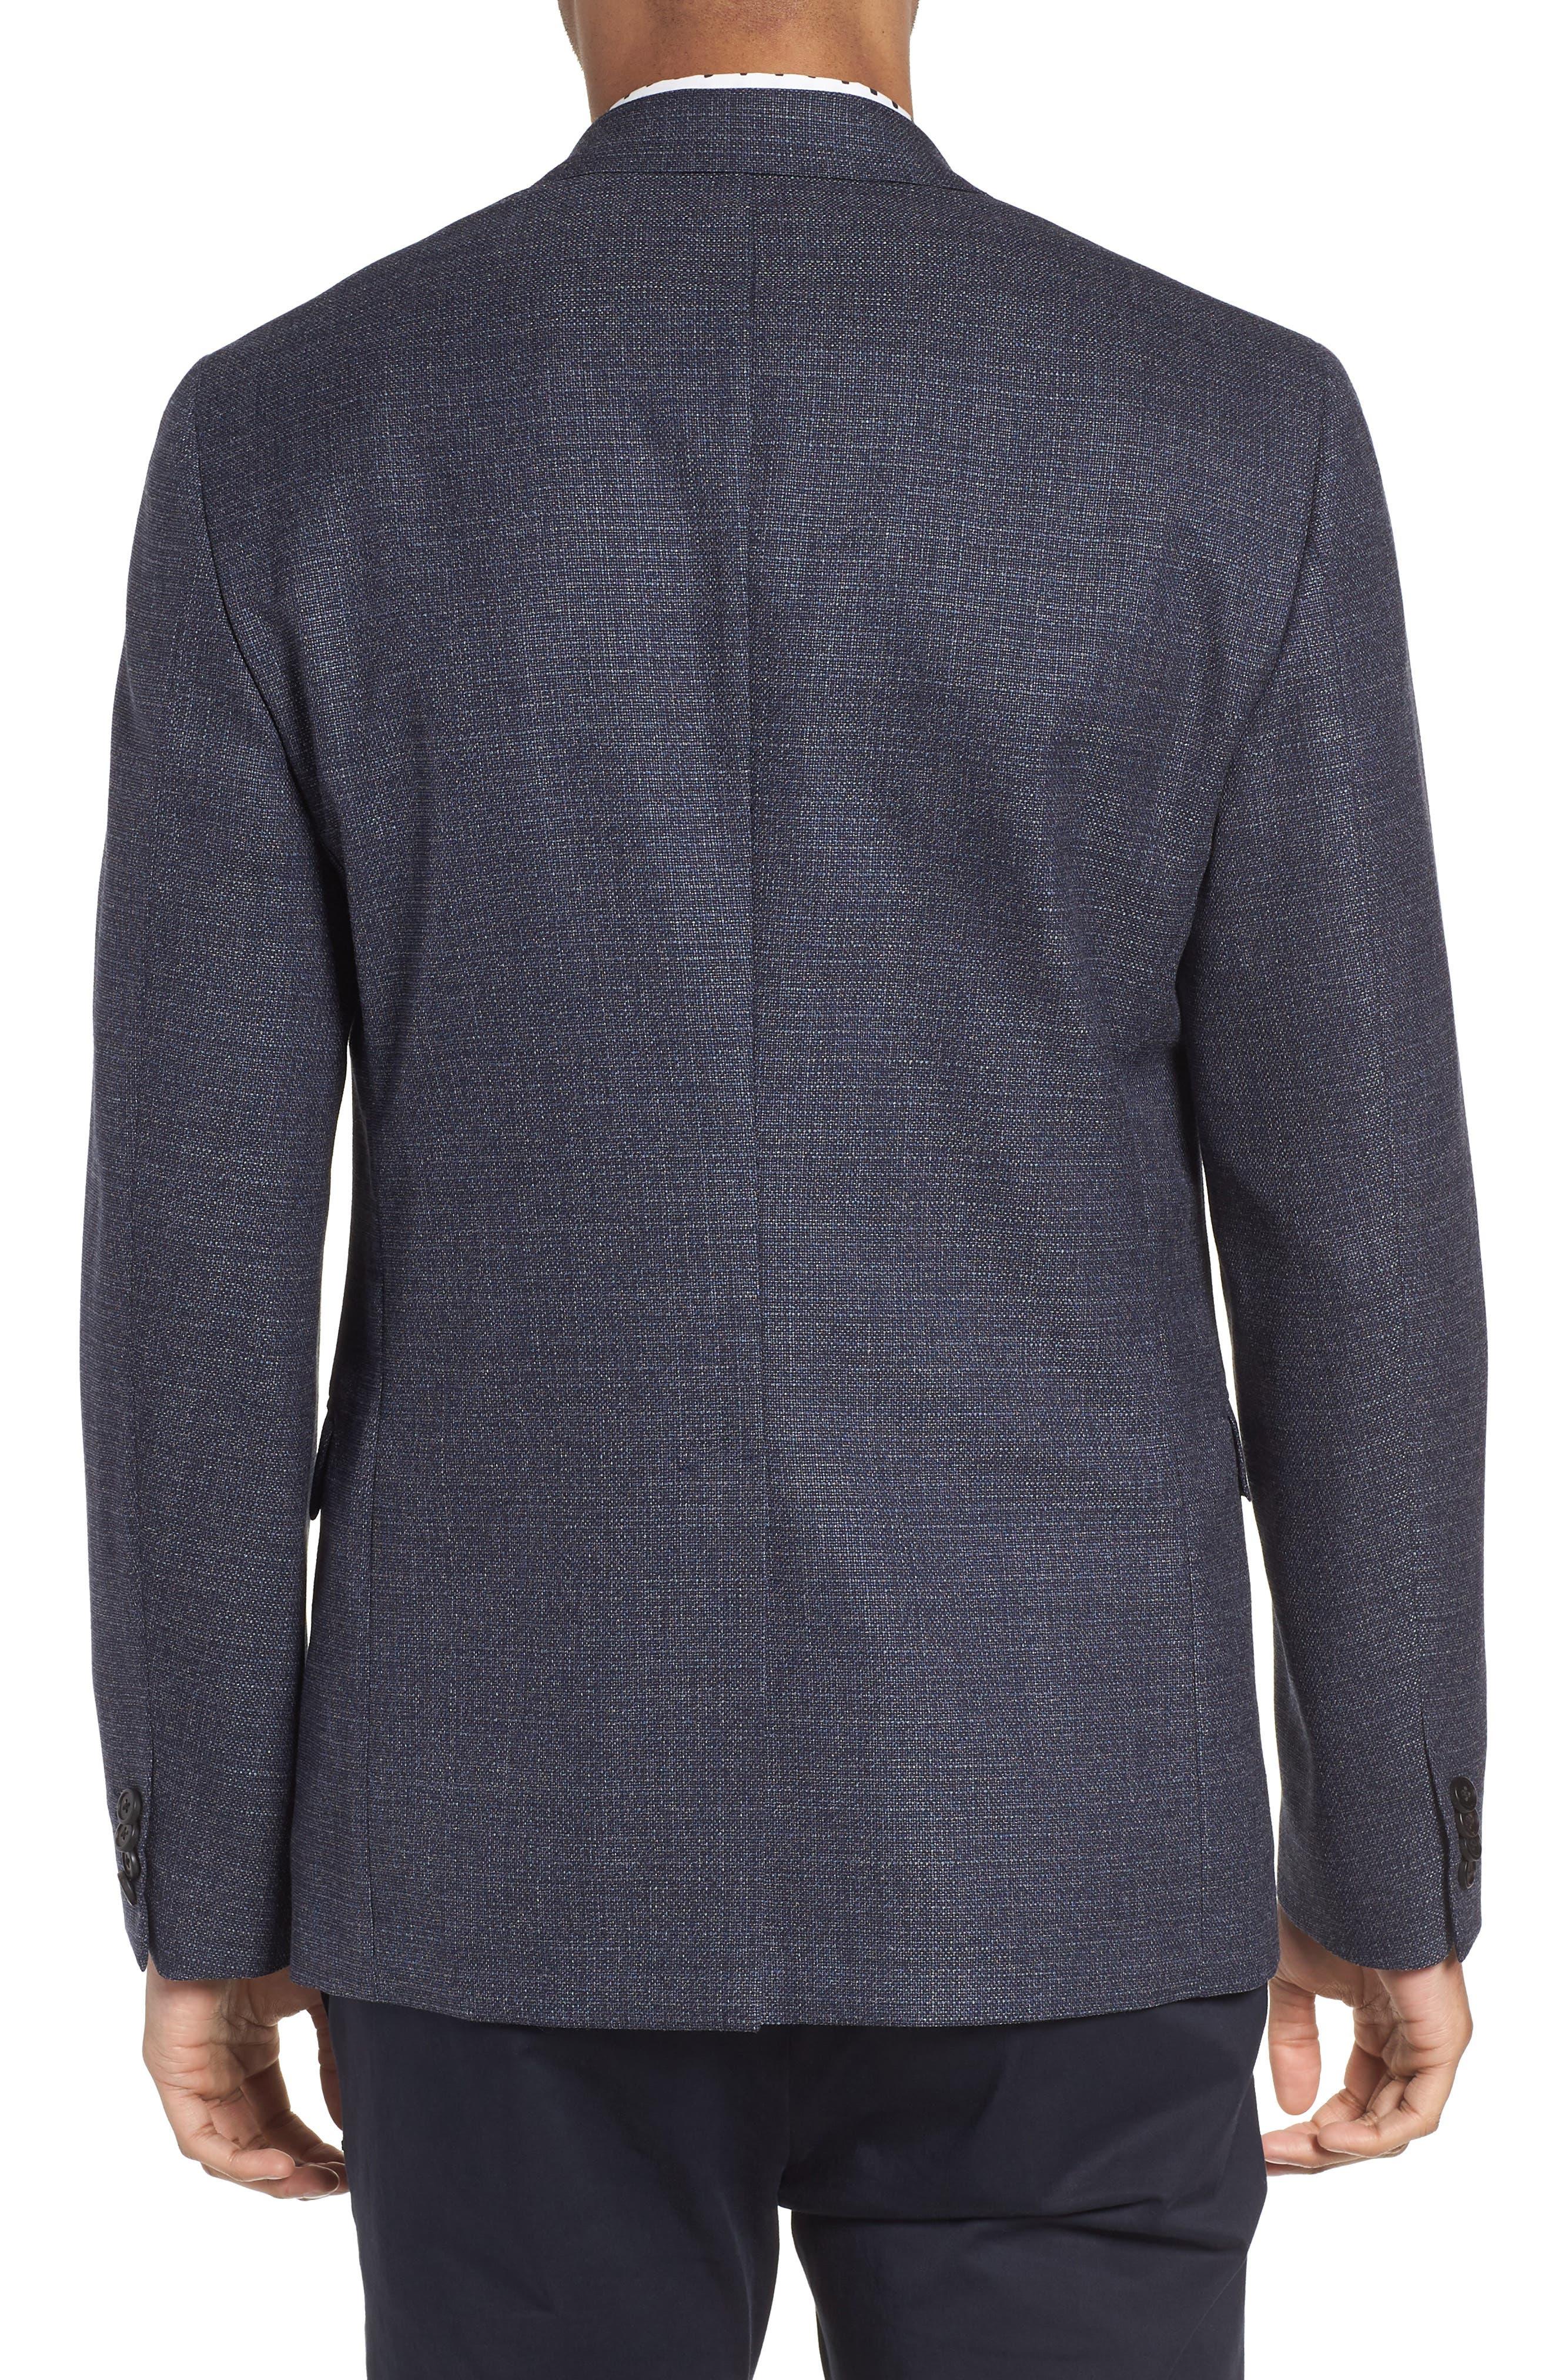 Gansevoort Regular Fit Wool Blazer,                             Alternate thumbnail 2, color,                             Storm